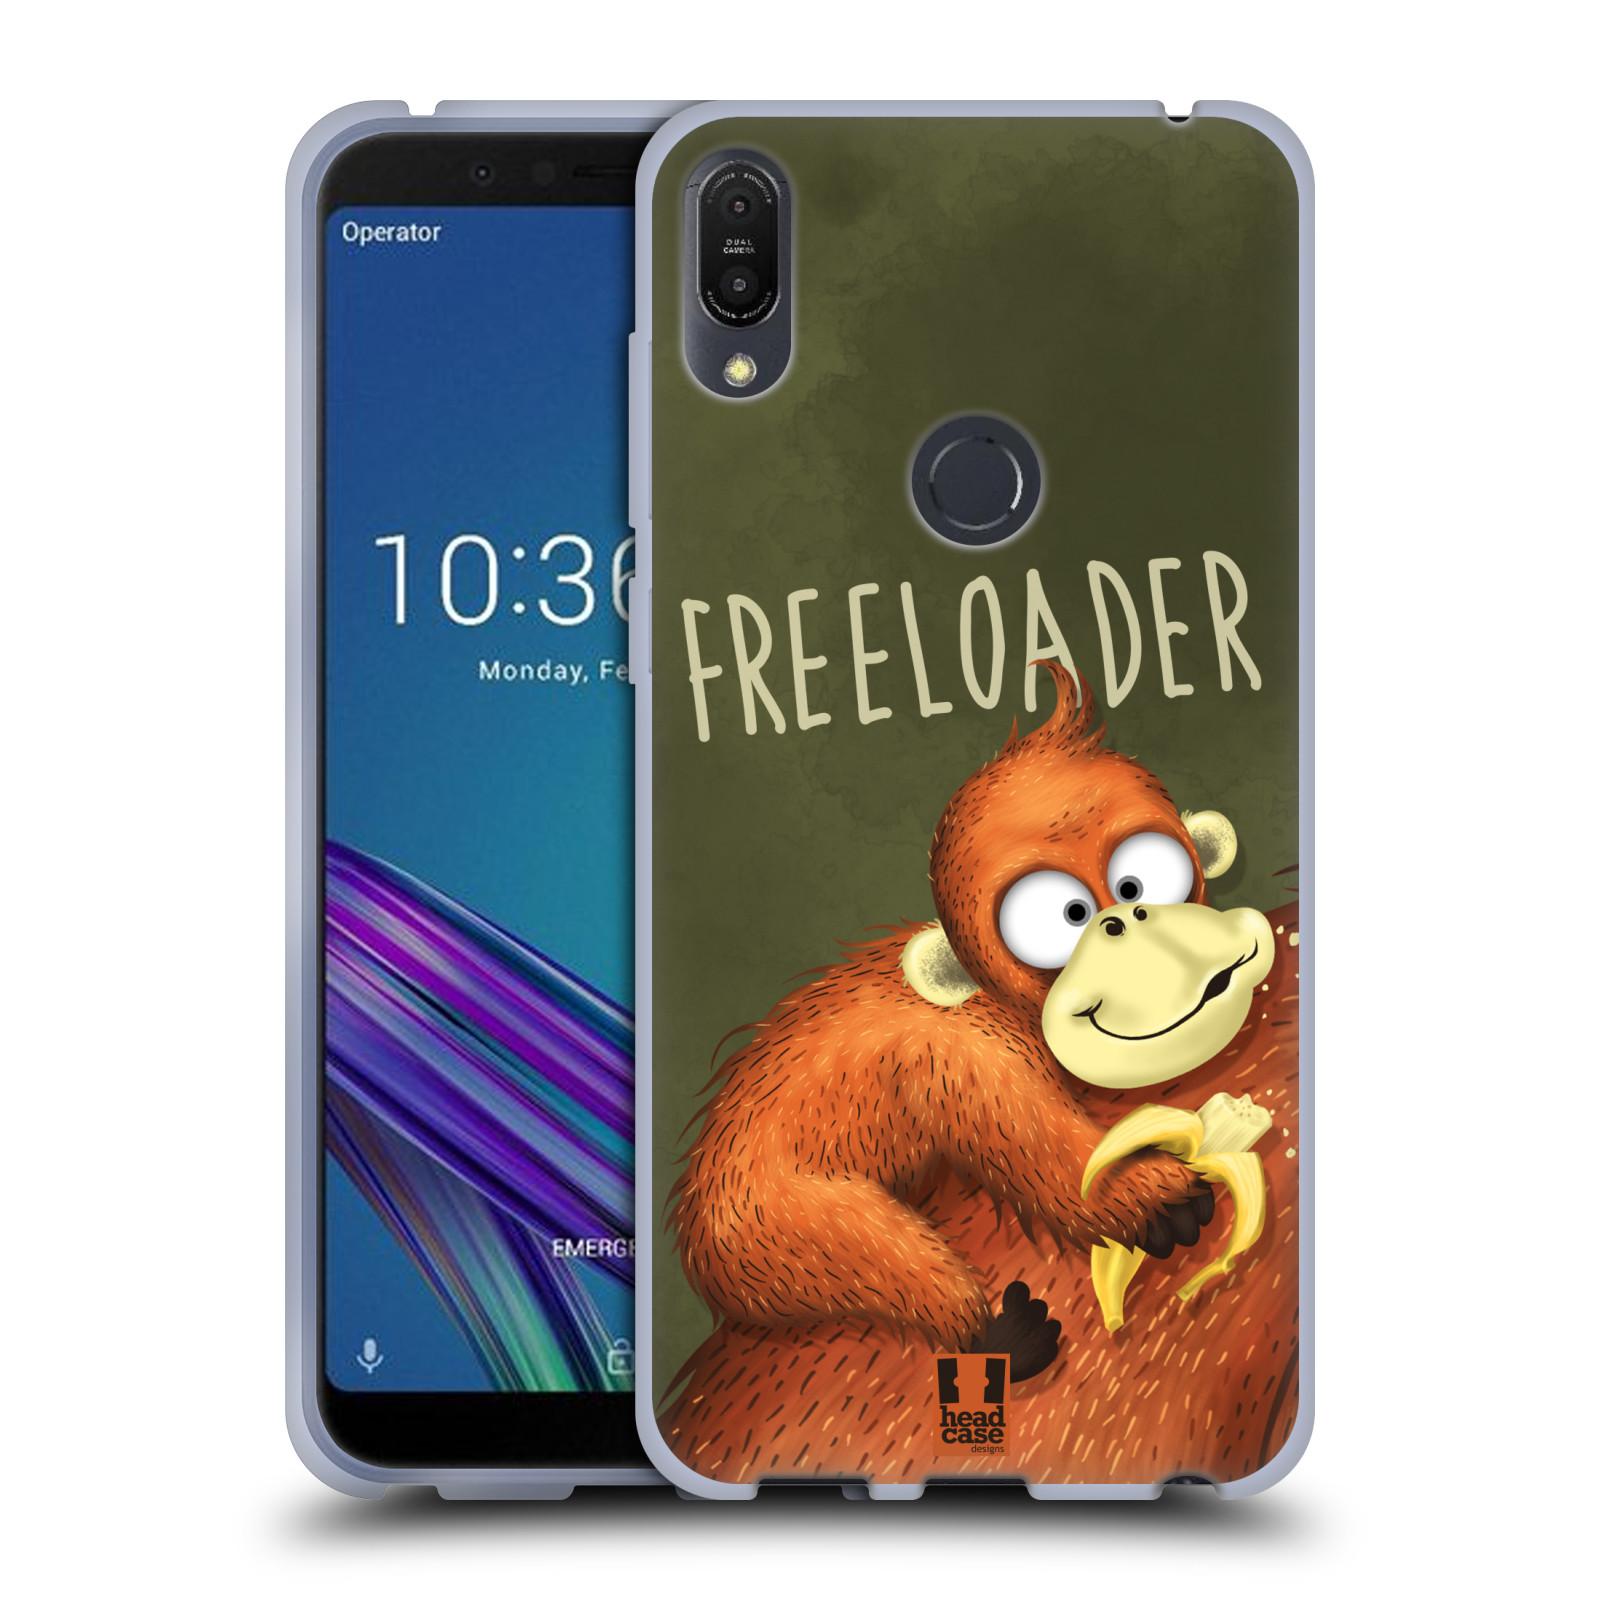 Silikonové pouzdro na mobil Asus ZenFone Max Pro (M1) - Head Case - Opičák Freeloader